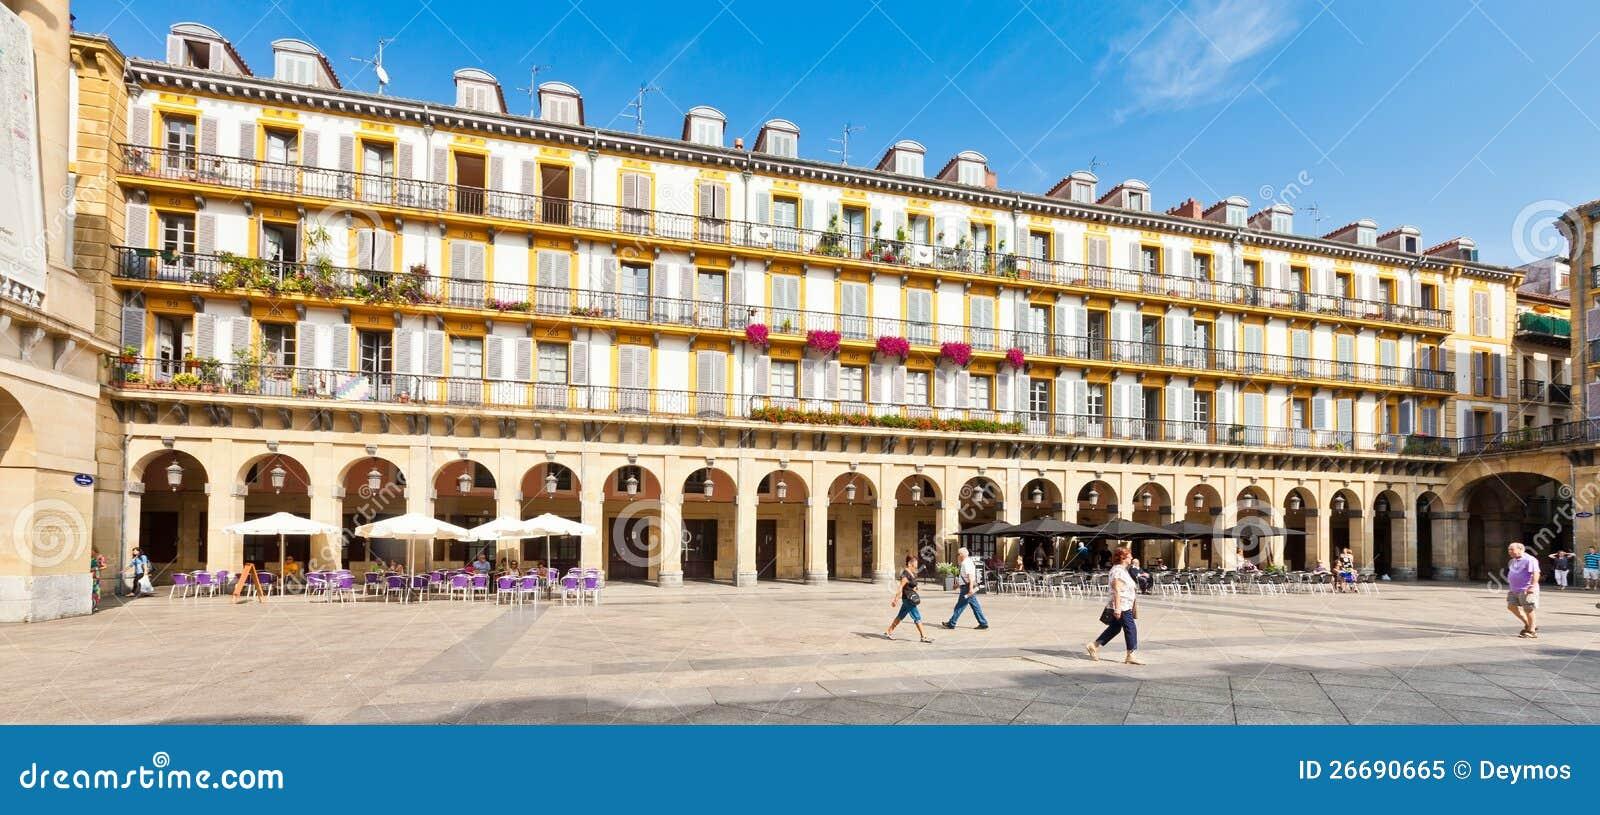 Plaza De La Constitucion In San Sebastian, Spain Editorial Image - Image: 266...